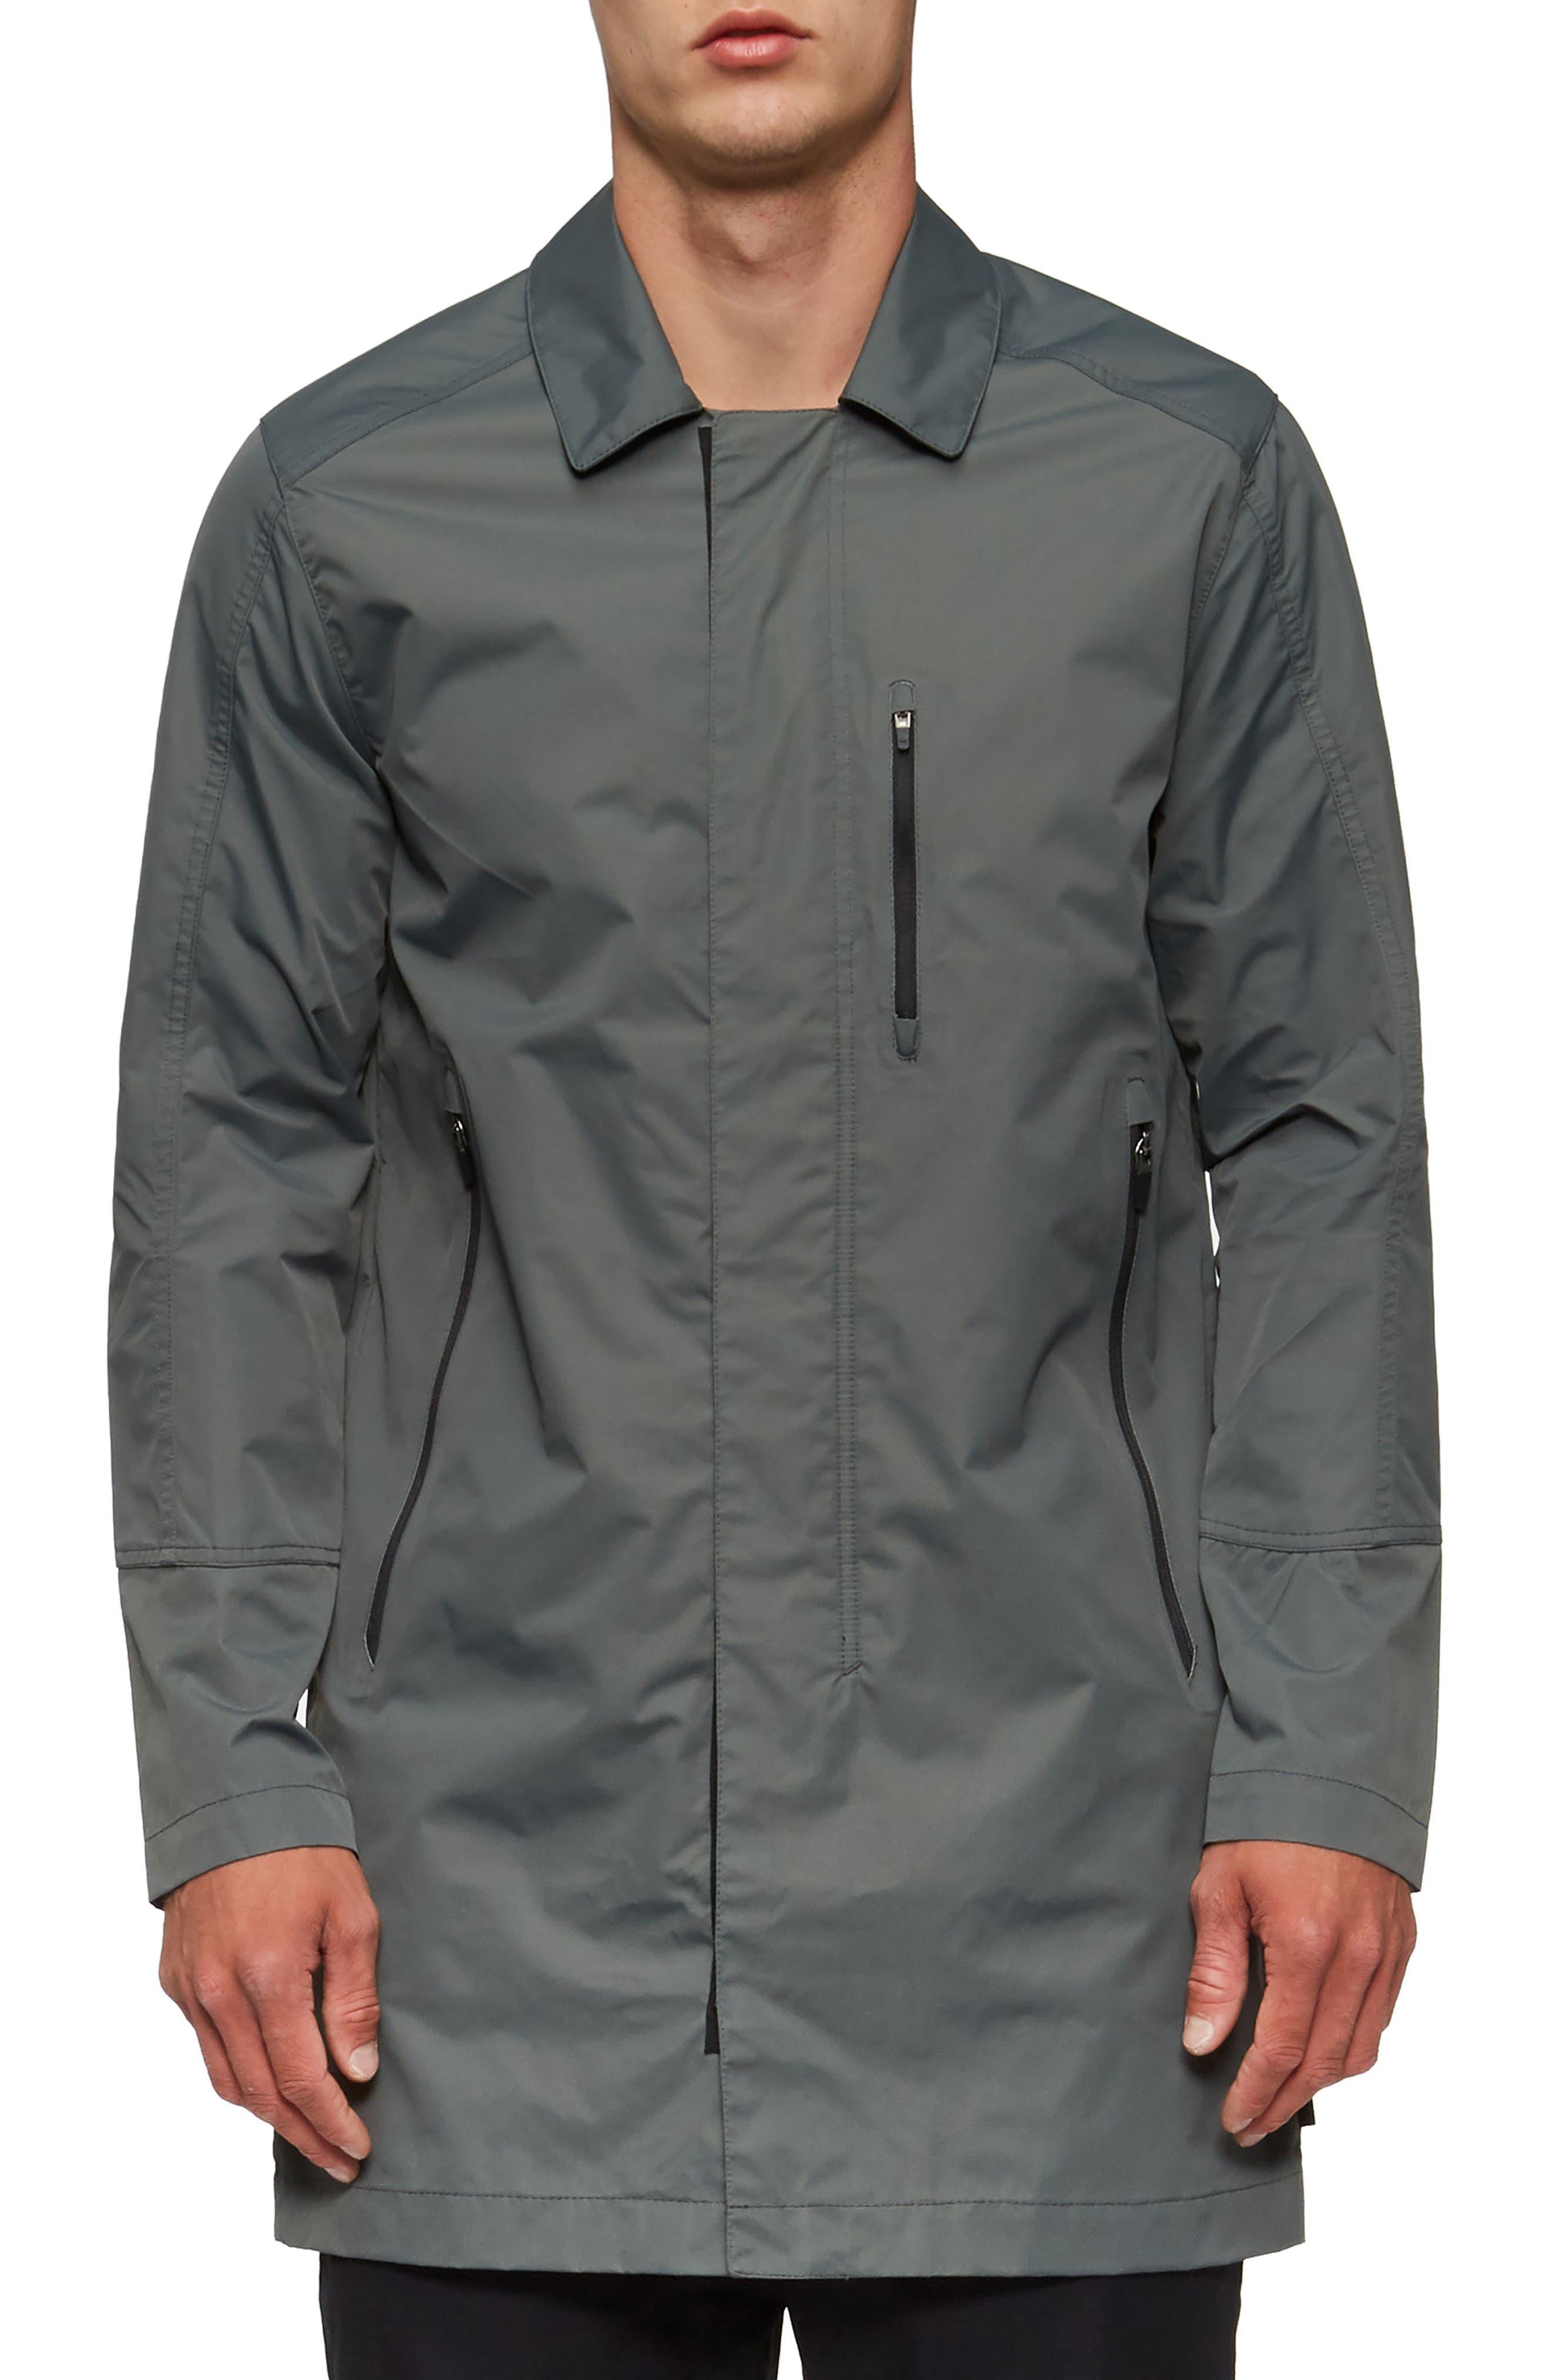 Alternate Image 1 Selected - TAVIK Deckard Weather Resistant Trench Coat